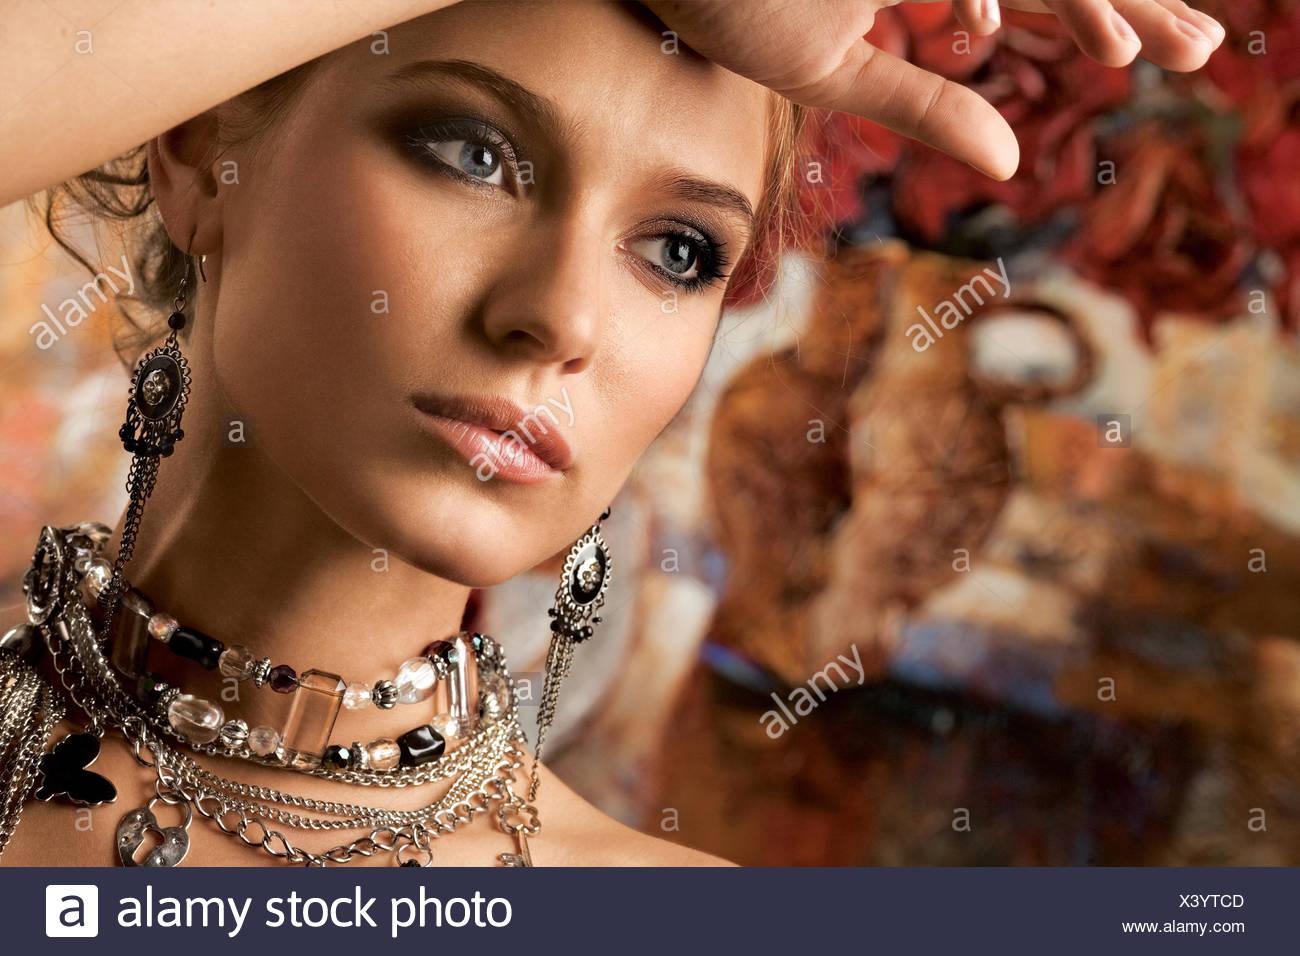 Glamorous Woman - Stock Image